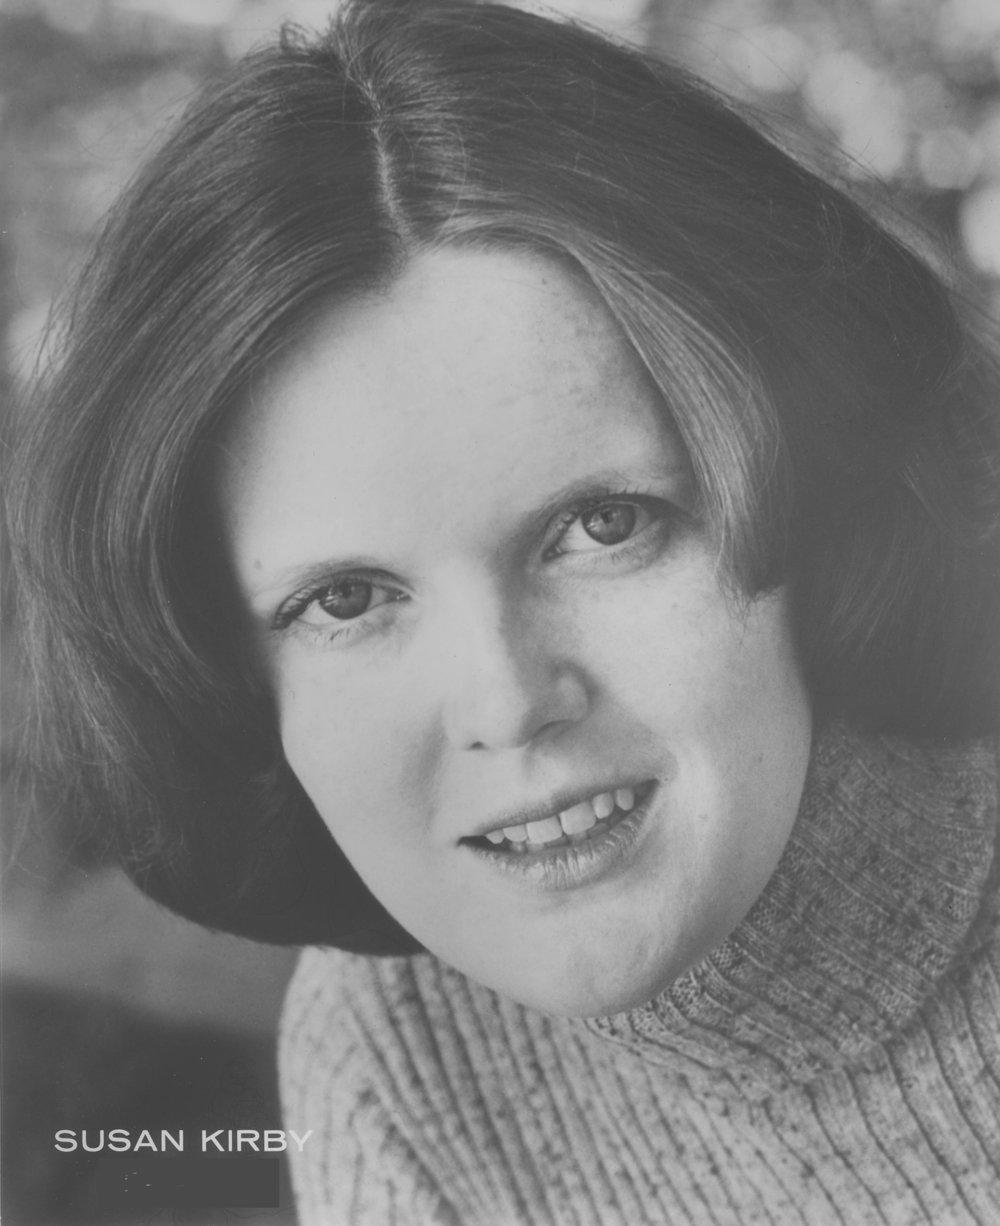 ca. 1975